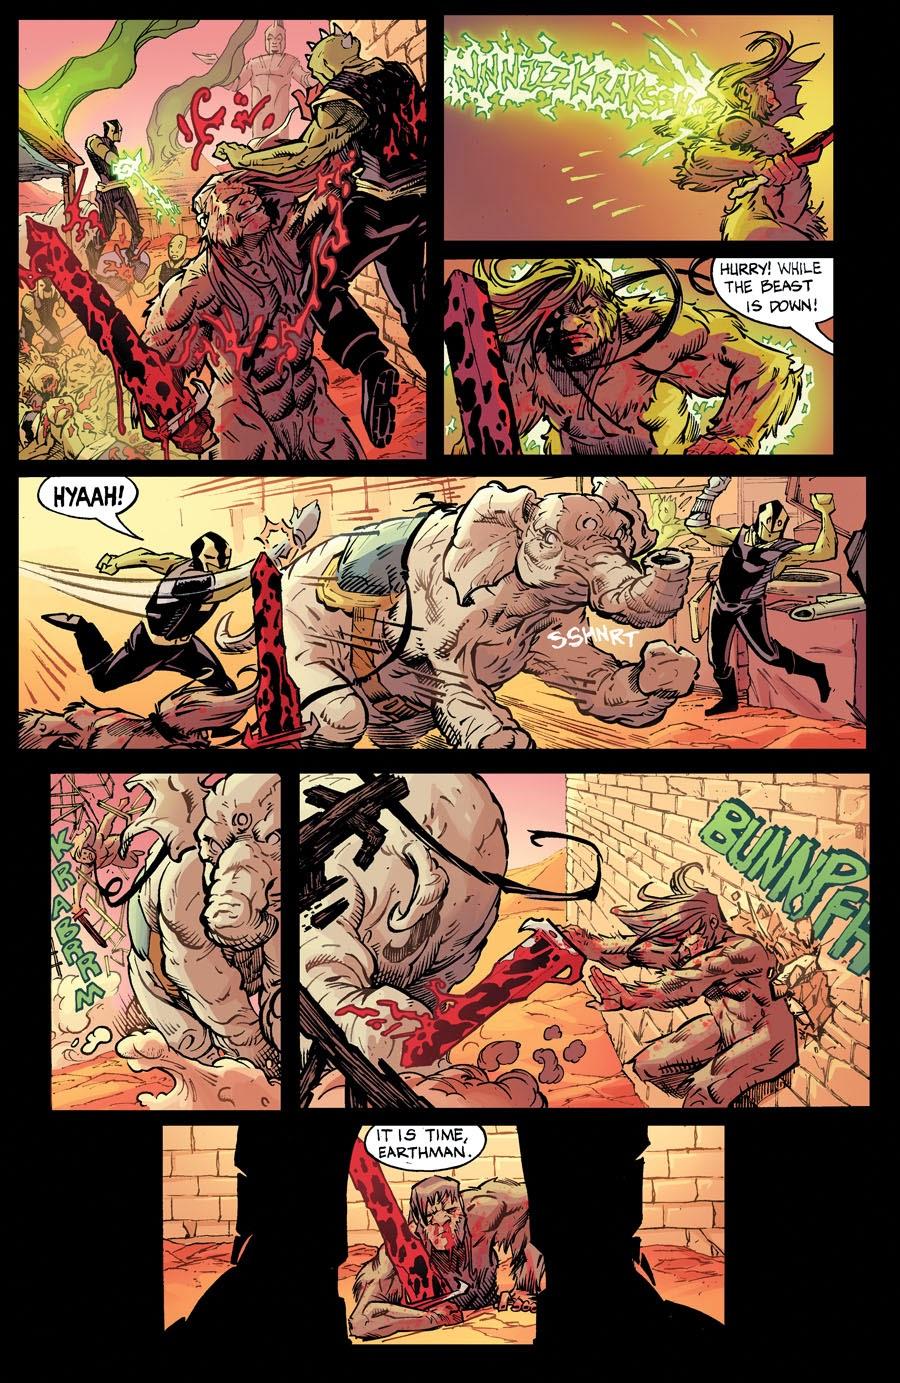 bigfoot sword of the earthman issue six issue 6 page three bigfoot comic book bigfoot graphic novel barbarian comic